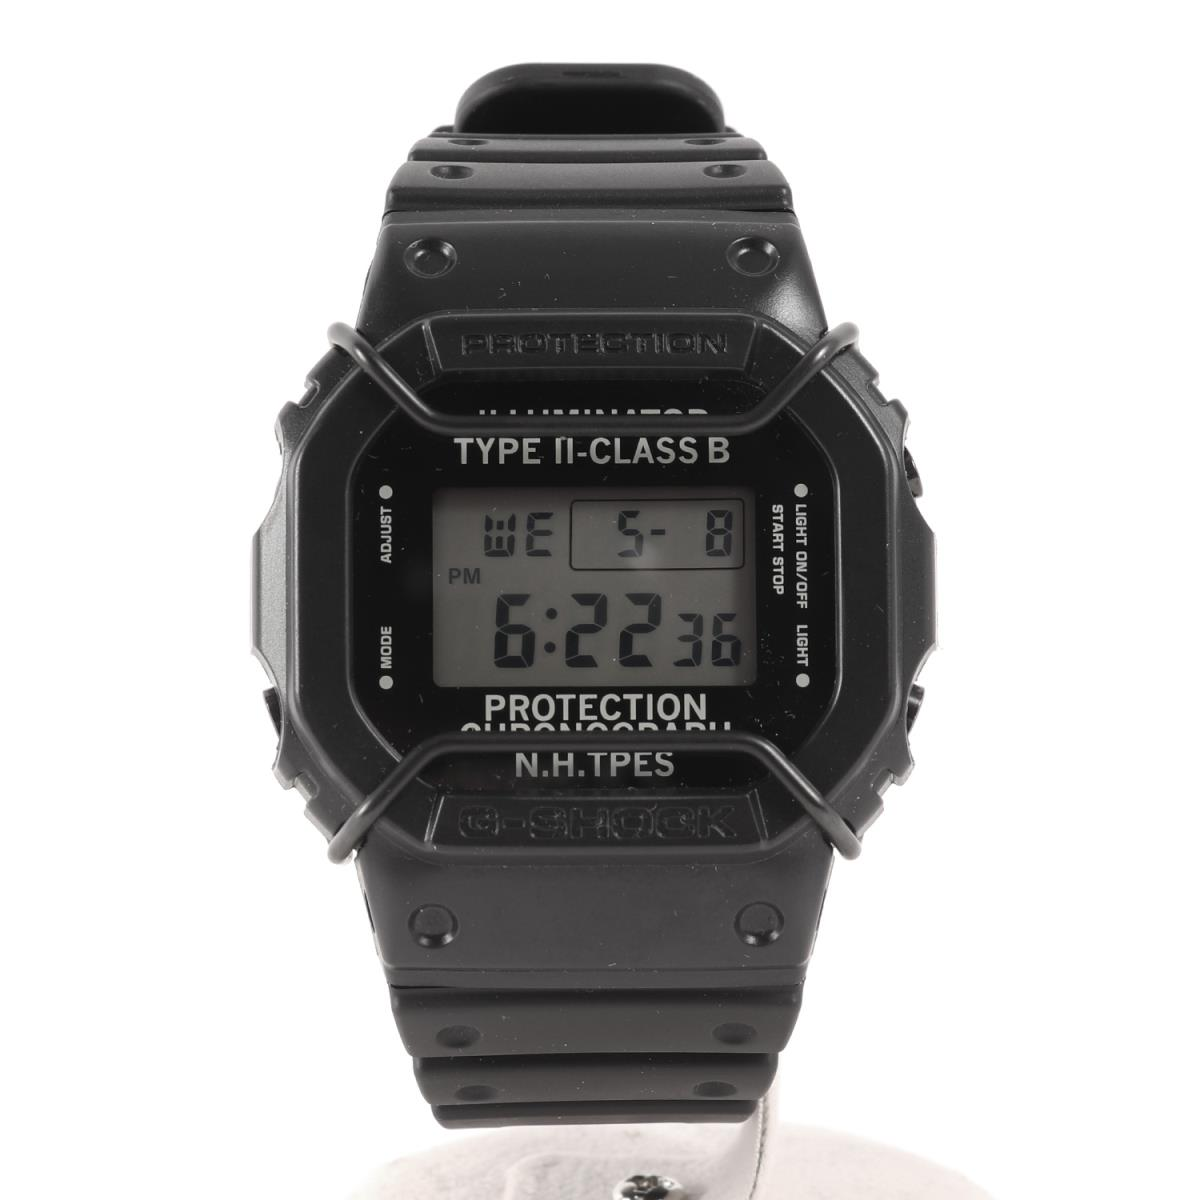 N.HOOLYWOOD (エヌハリウッド) ×CASIO G-SHOCK DW-5600NH-1A2JR 腕時計 ウォッチ ブラック 【メンズ】【中古】【K2281】【あす楽☆対応可】